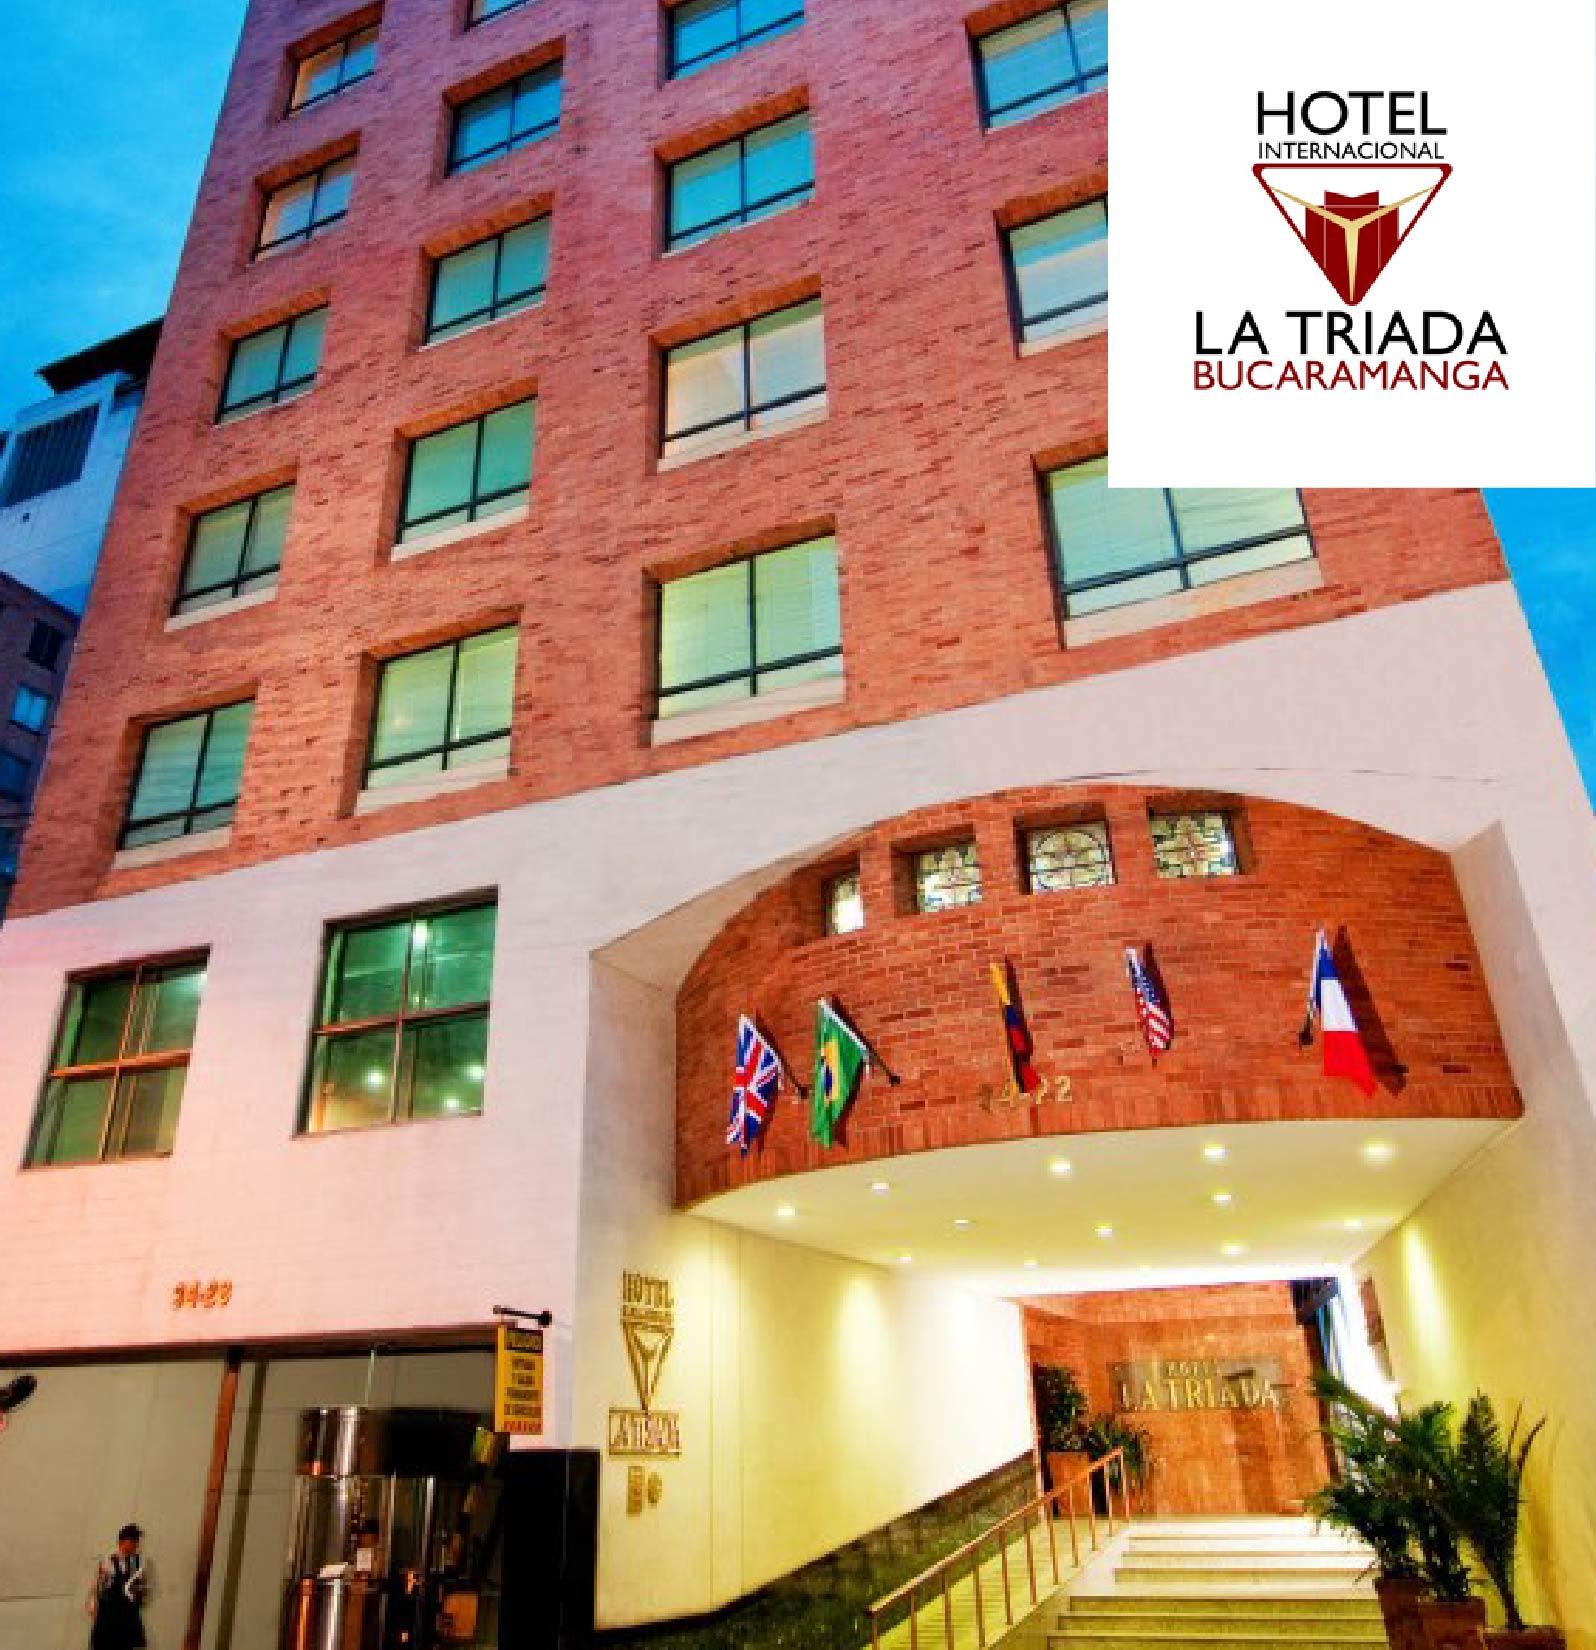 hotel la triada bucaramanga-01-01